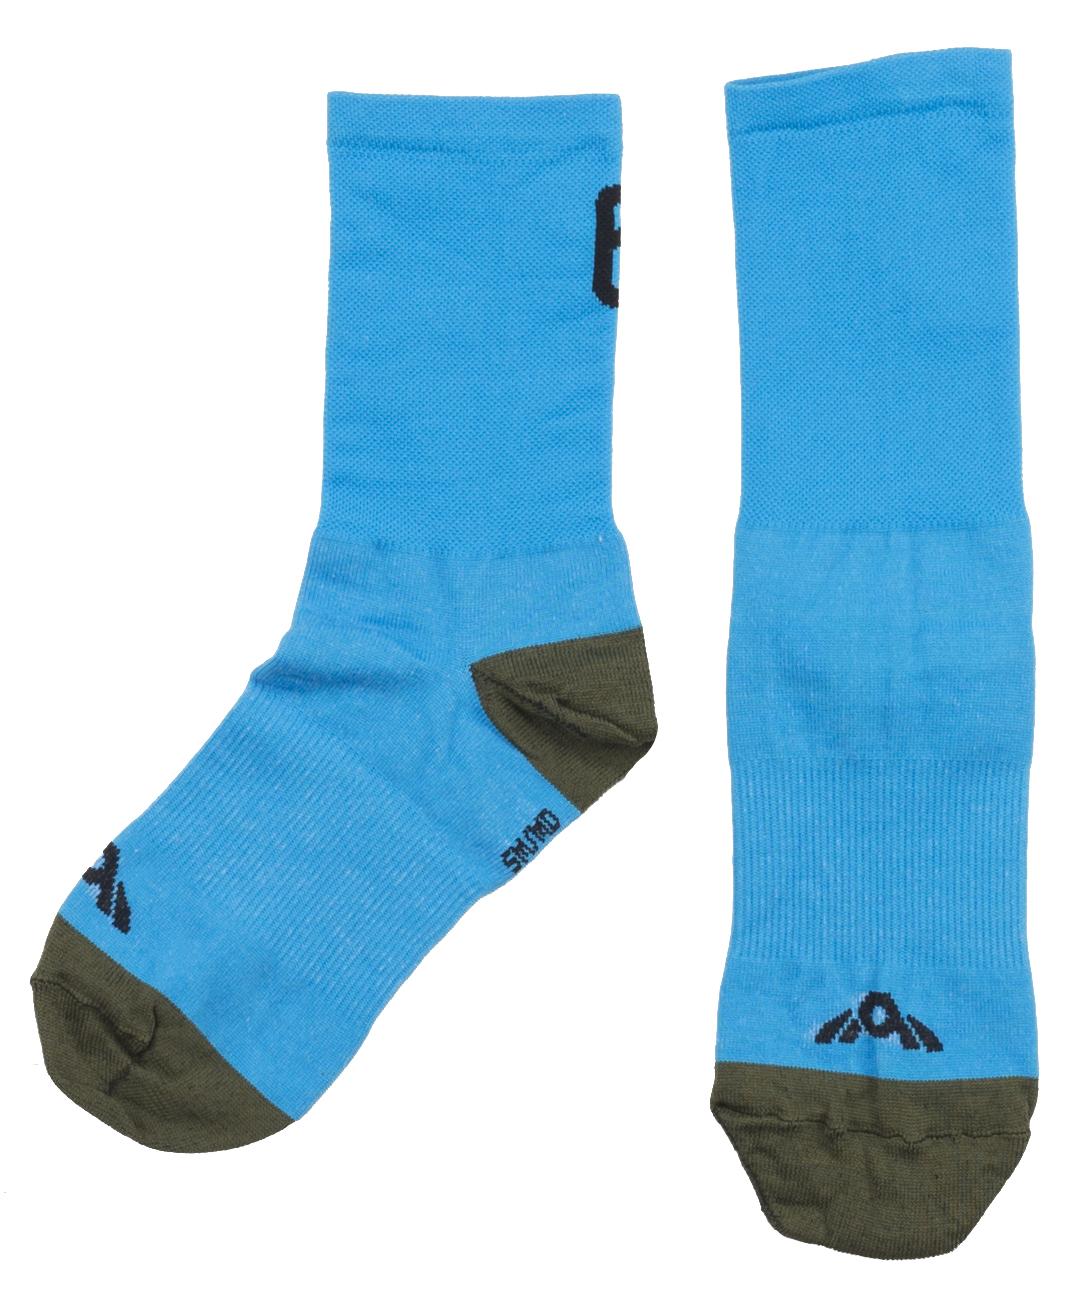 Twin Six Standard Cycling Socks Blue, SM/Med Men's Size Small/Medium